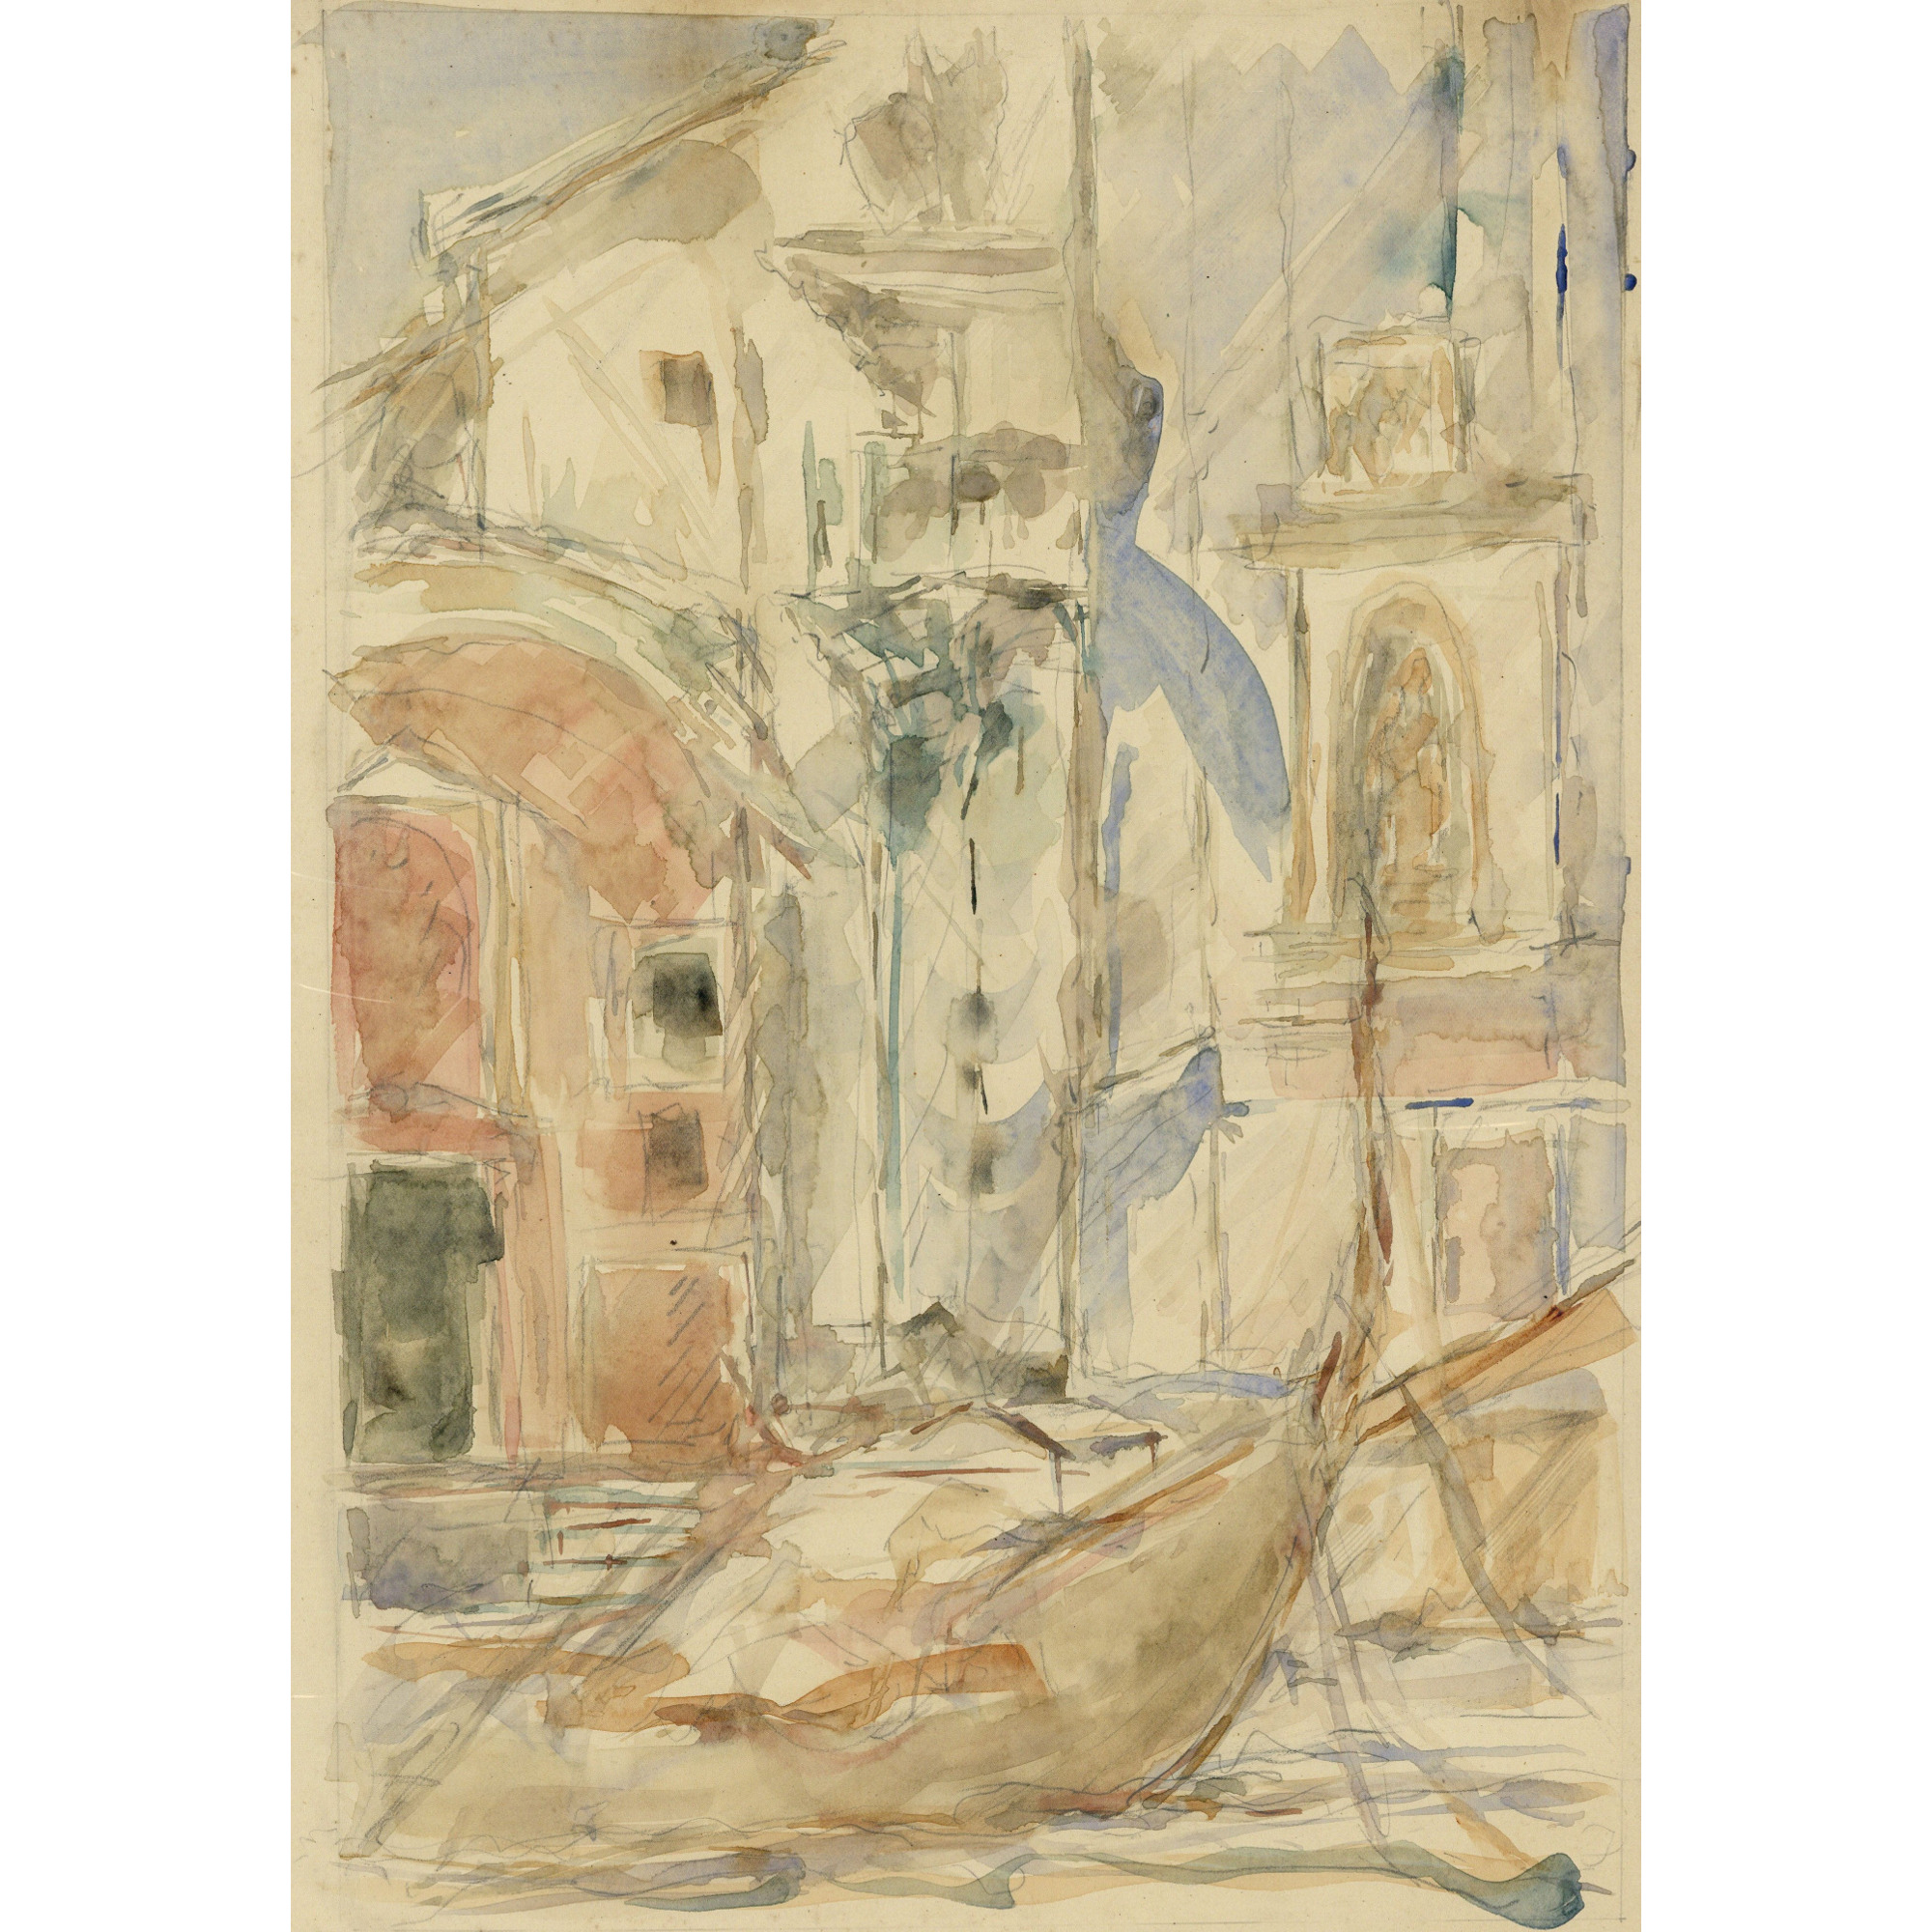 Pre-Raphaelite Drawing of a Gondola, Venice, Italy